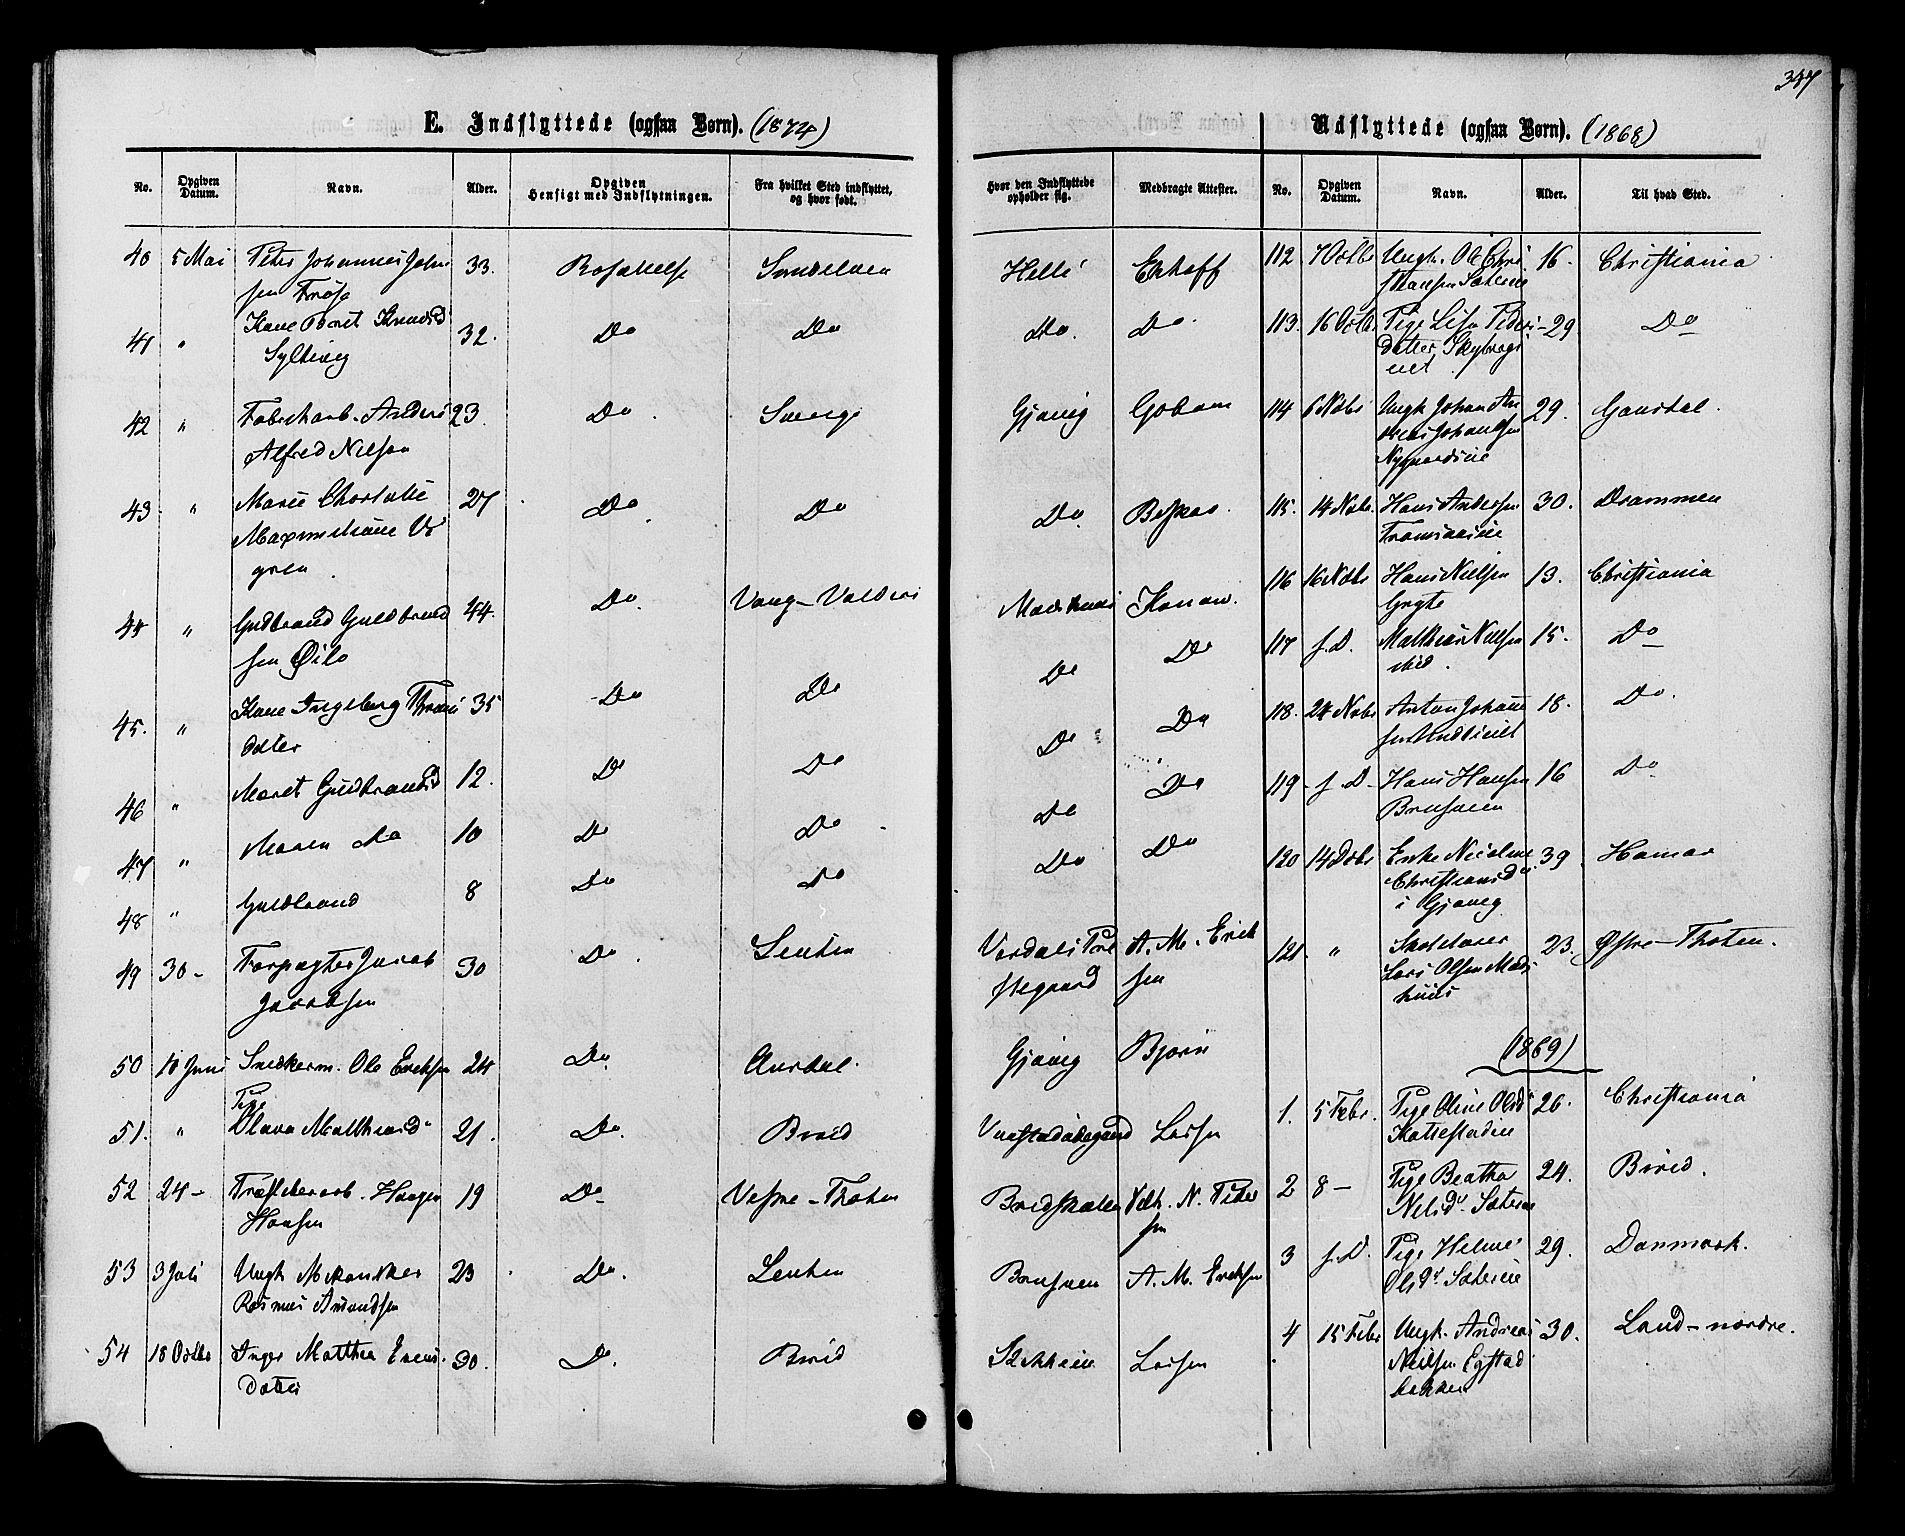 SAH, Vardal prestekontor, H/Ha/Haa/L0007: Ministerialbok nr. 7, 1867-1878, s. 347